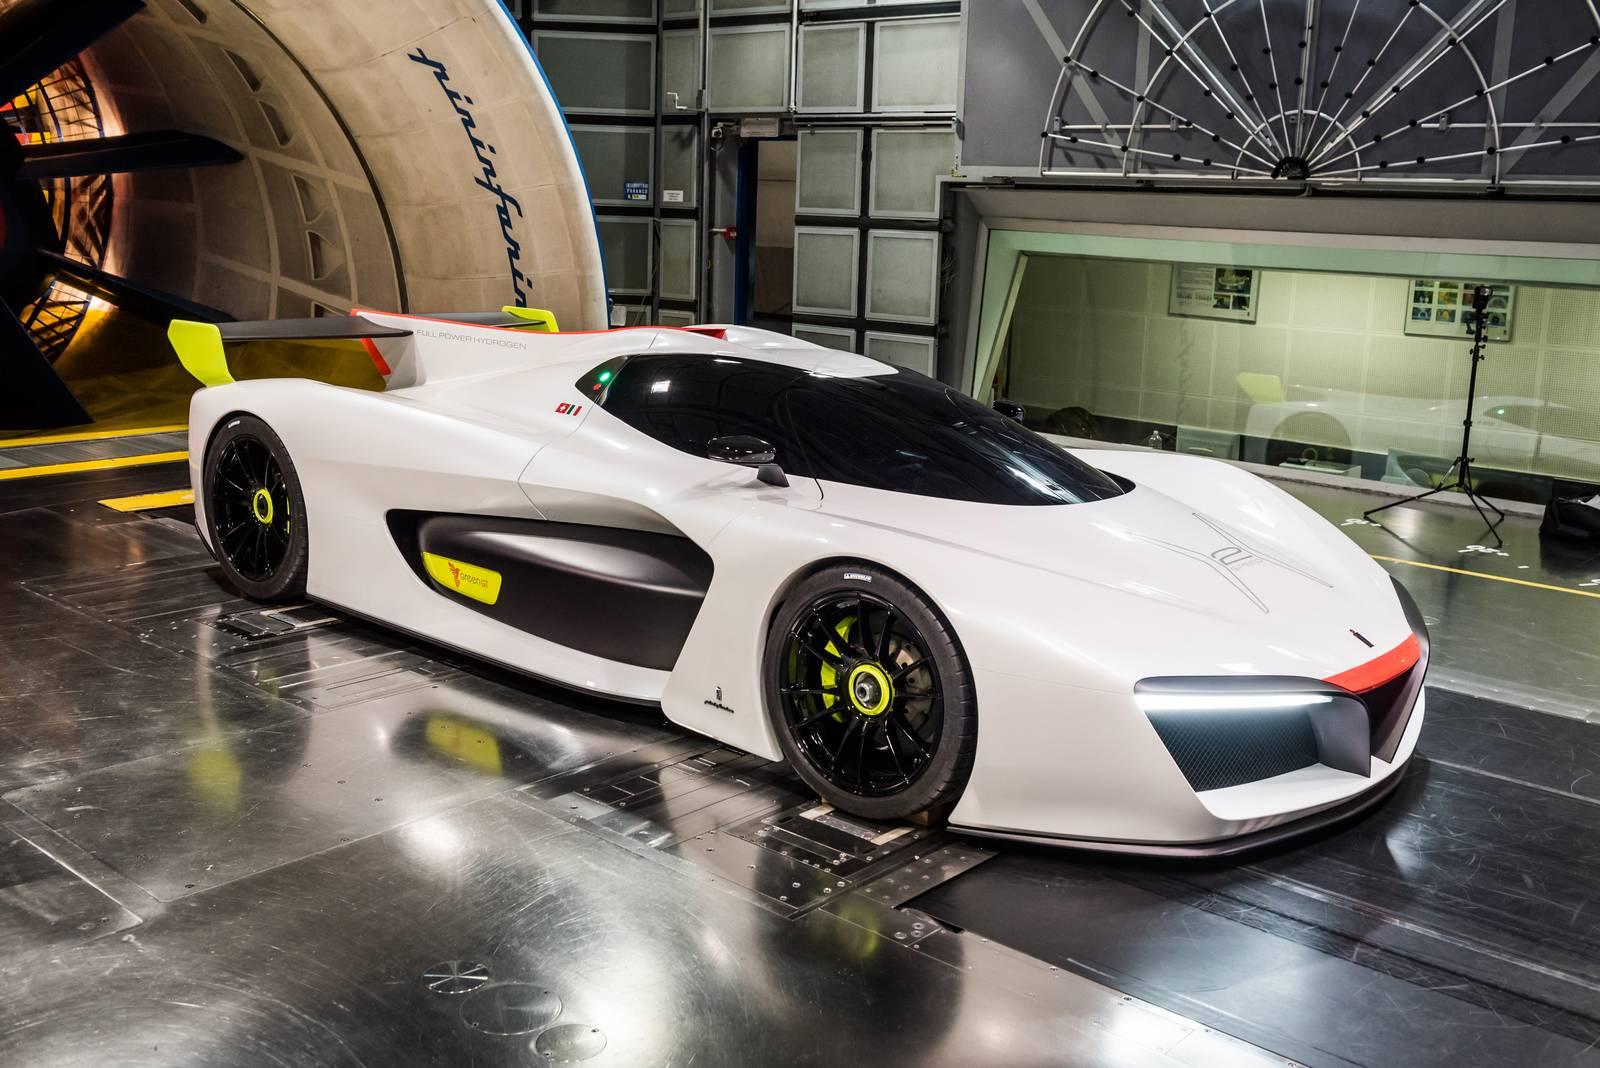 Pininfarina H2 Speed 4 1 8 εκπληκτικά concepts που θα ήθελες να βγουν στην παραγωγή zblog, αυτοκίνητα